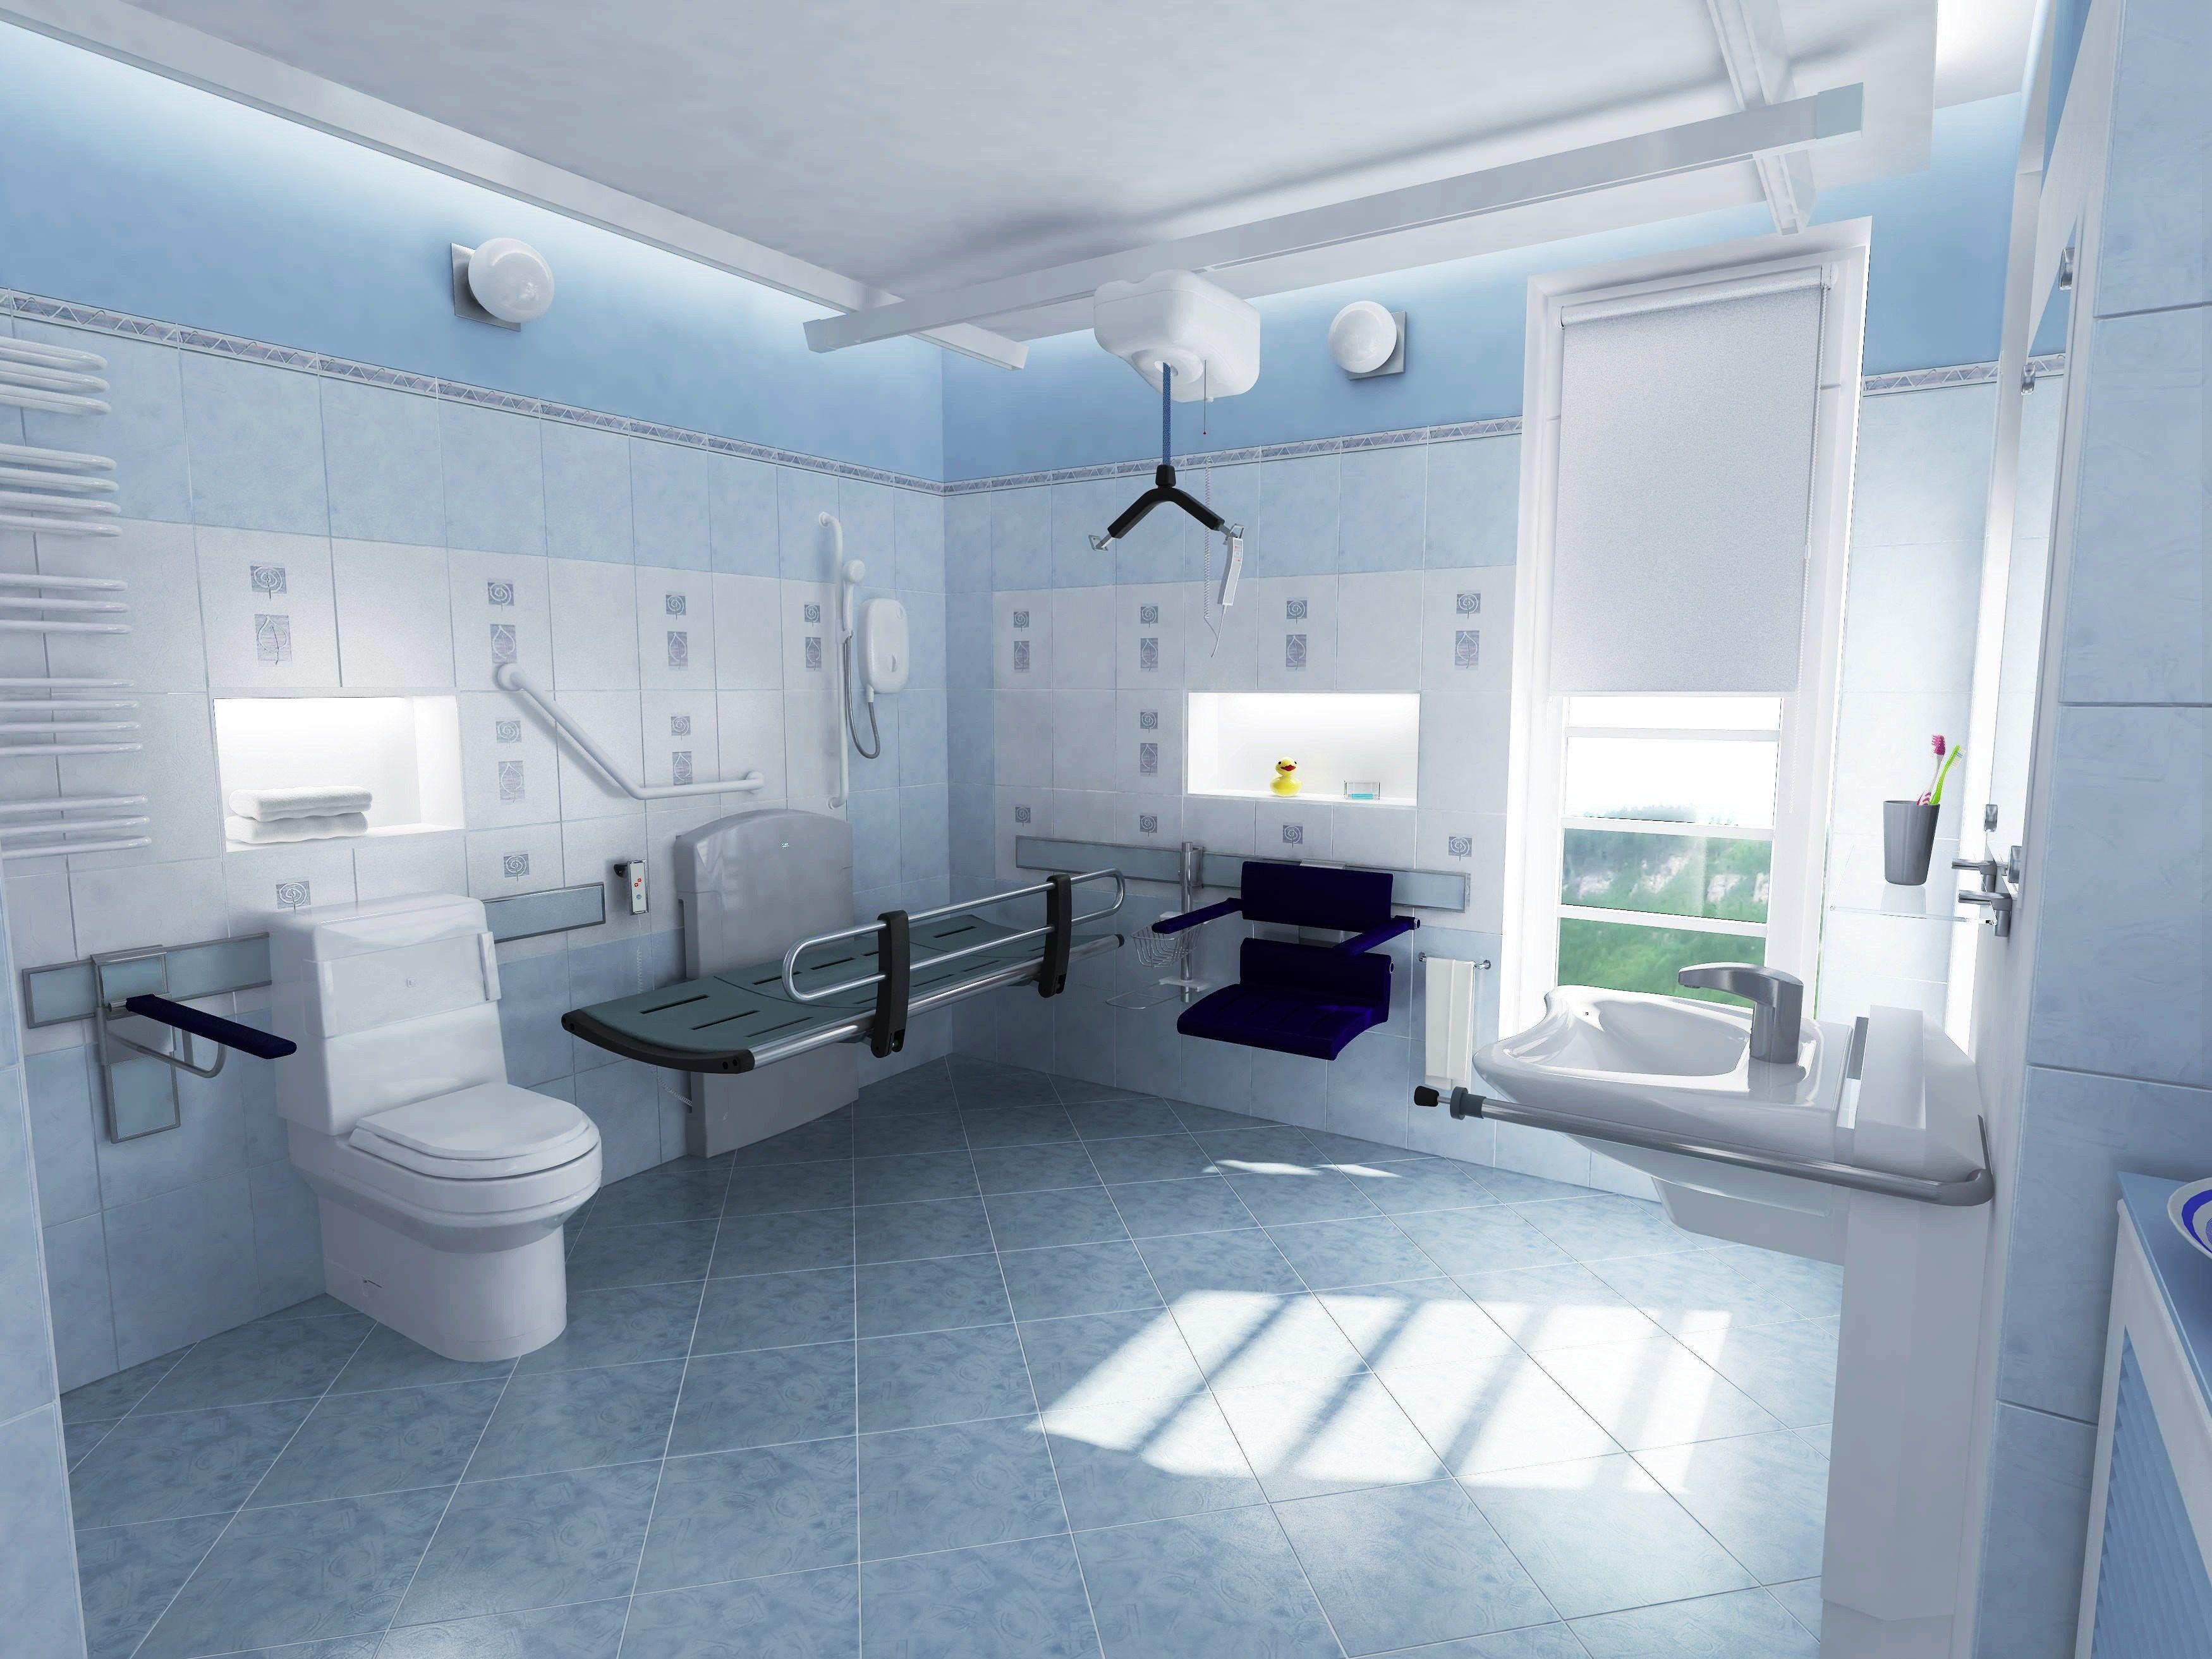 Accessible Bathroom Designs Glamorous Luxury Accessible Bathroom Designs  Bathroom Designs And Luxury Design Ideas